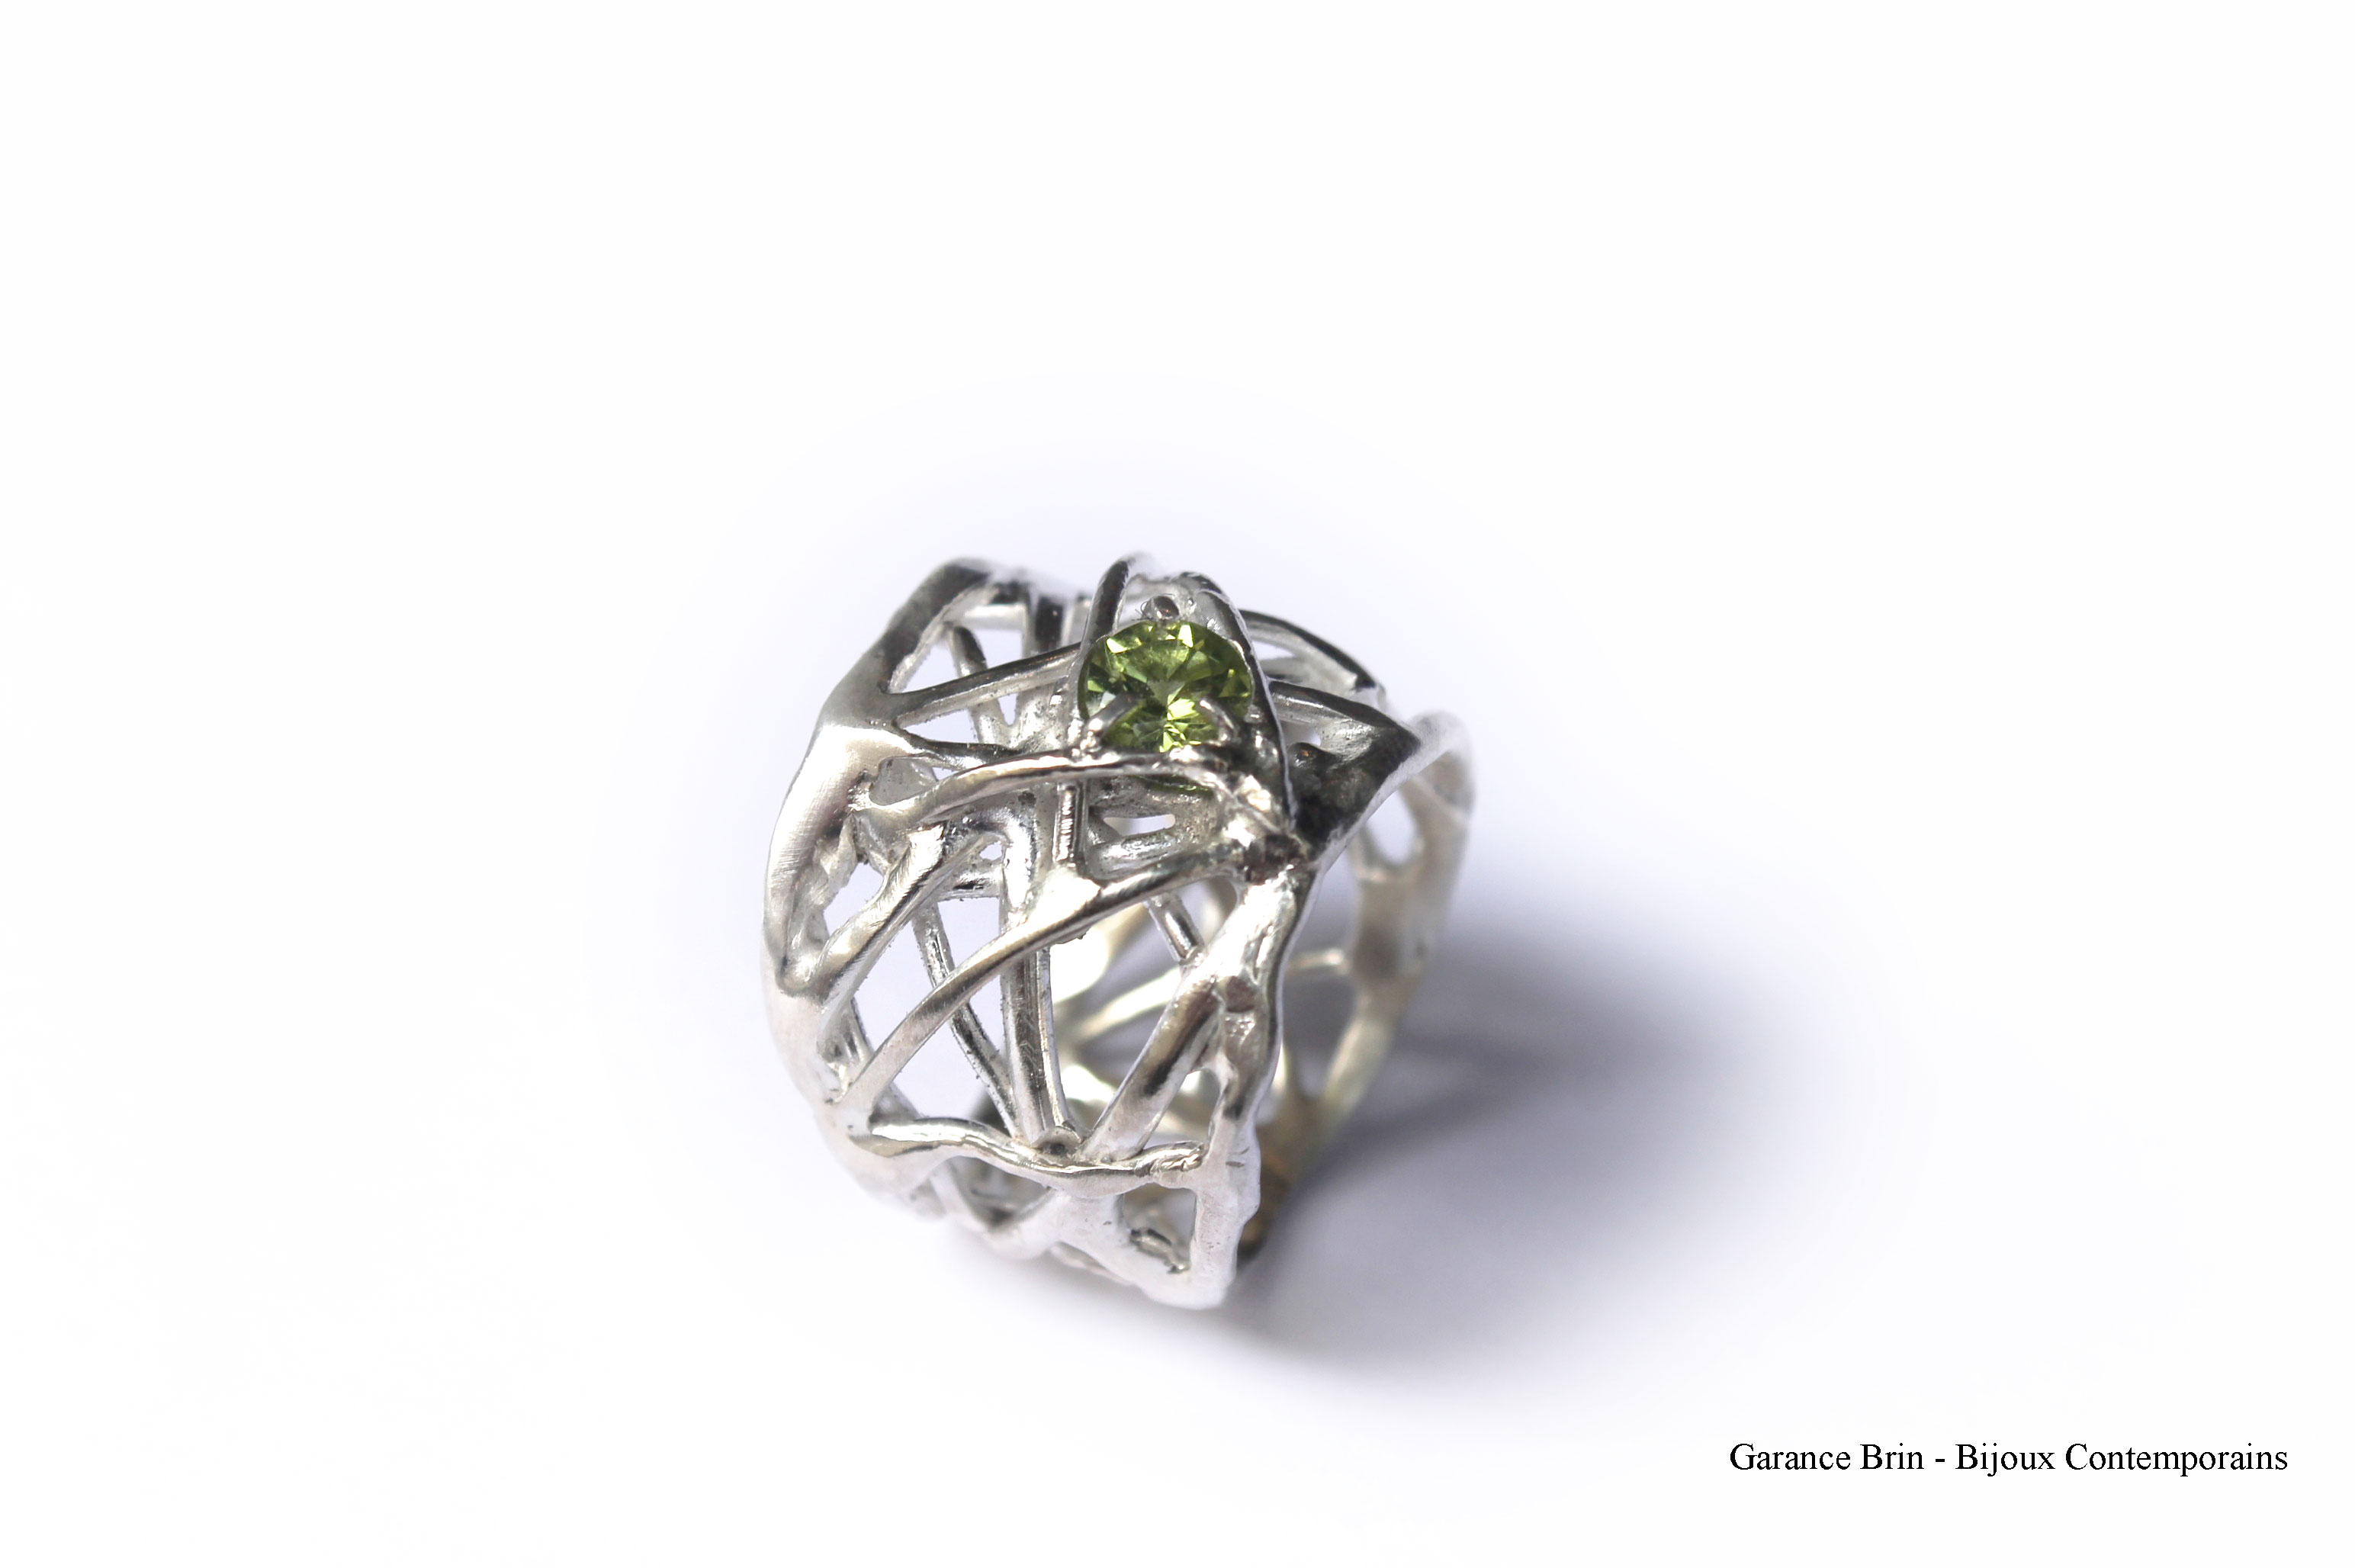 Bague brut joaillerie - argent, péridot - Bijoux contemporains Garance BRIN